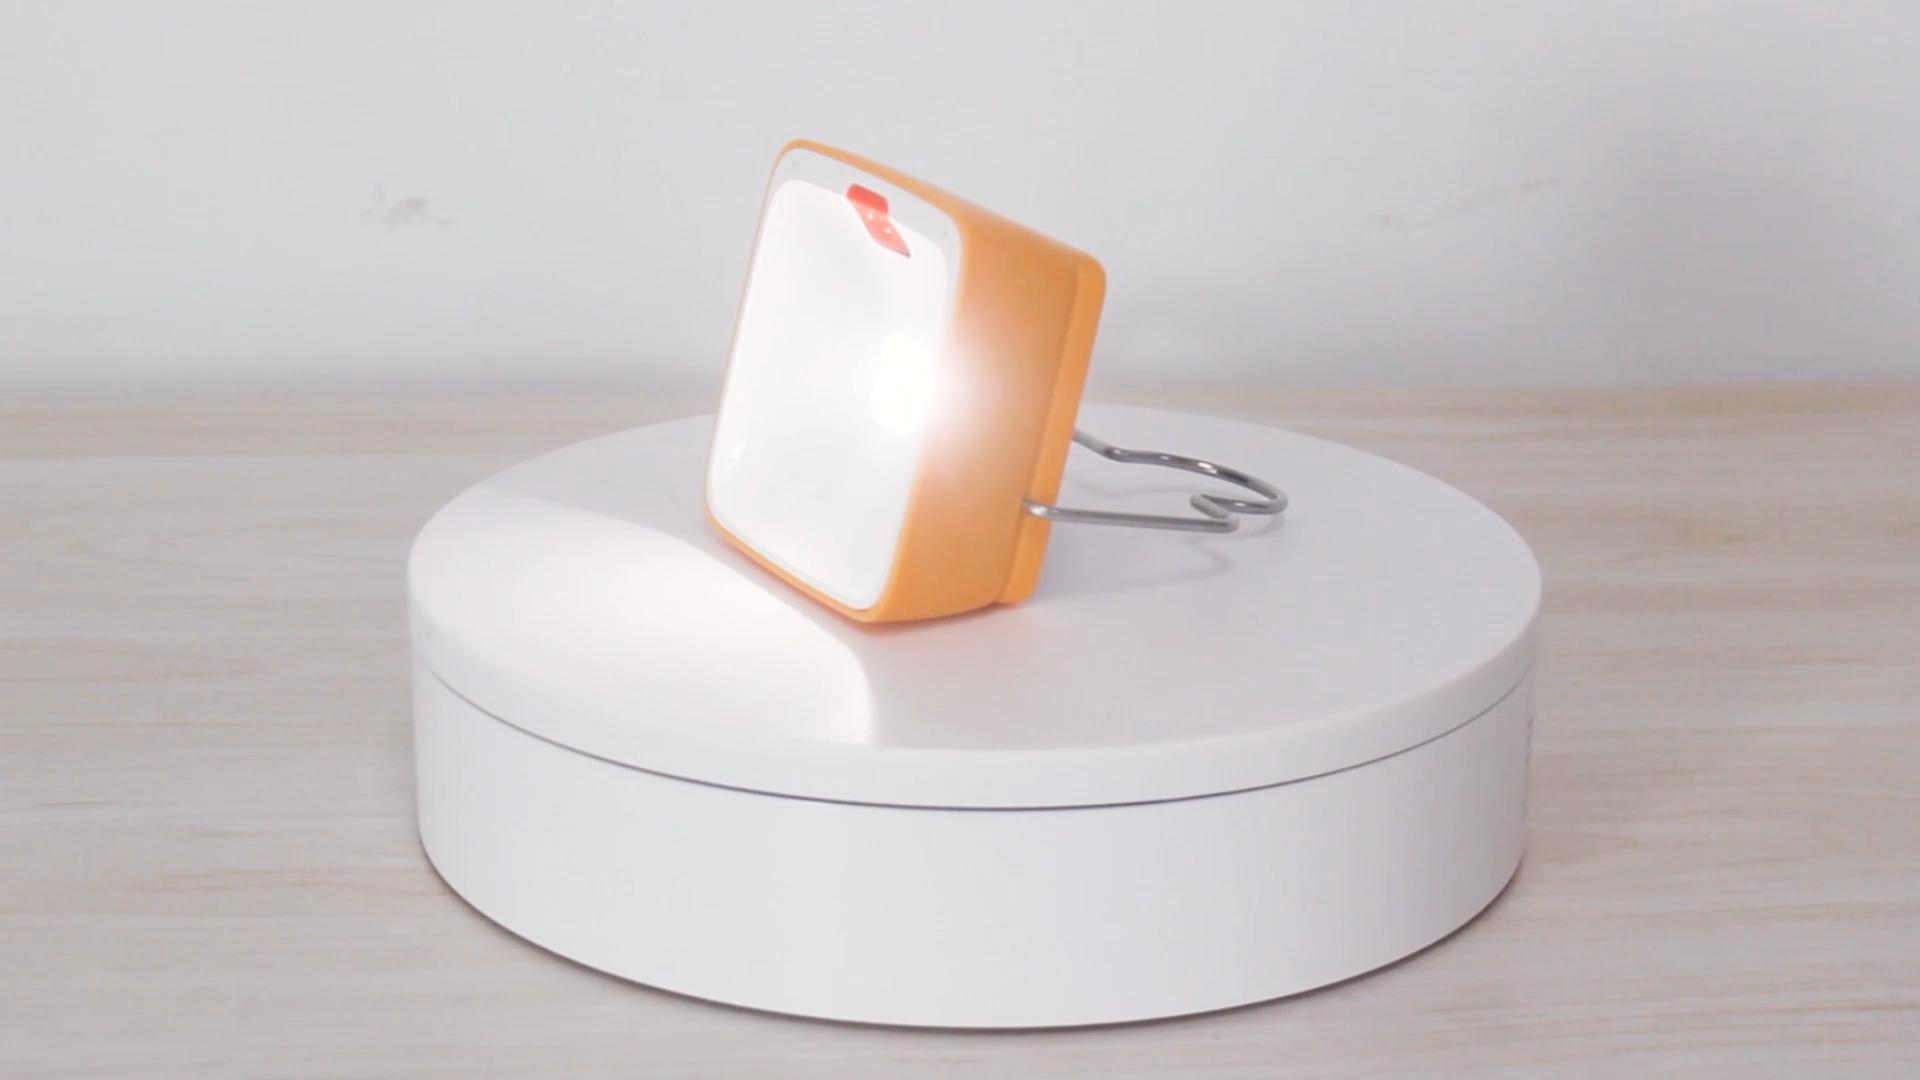 Portable small solar led table reading lamp Solar kerosene lamp with stainless stand design